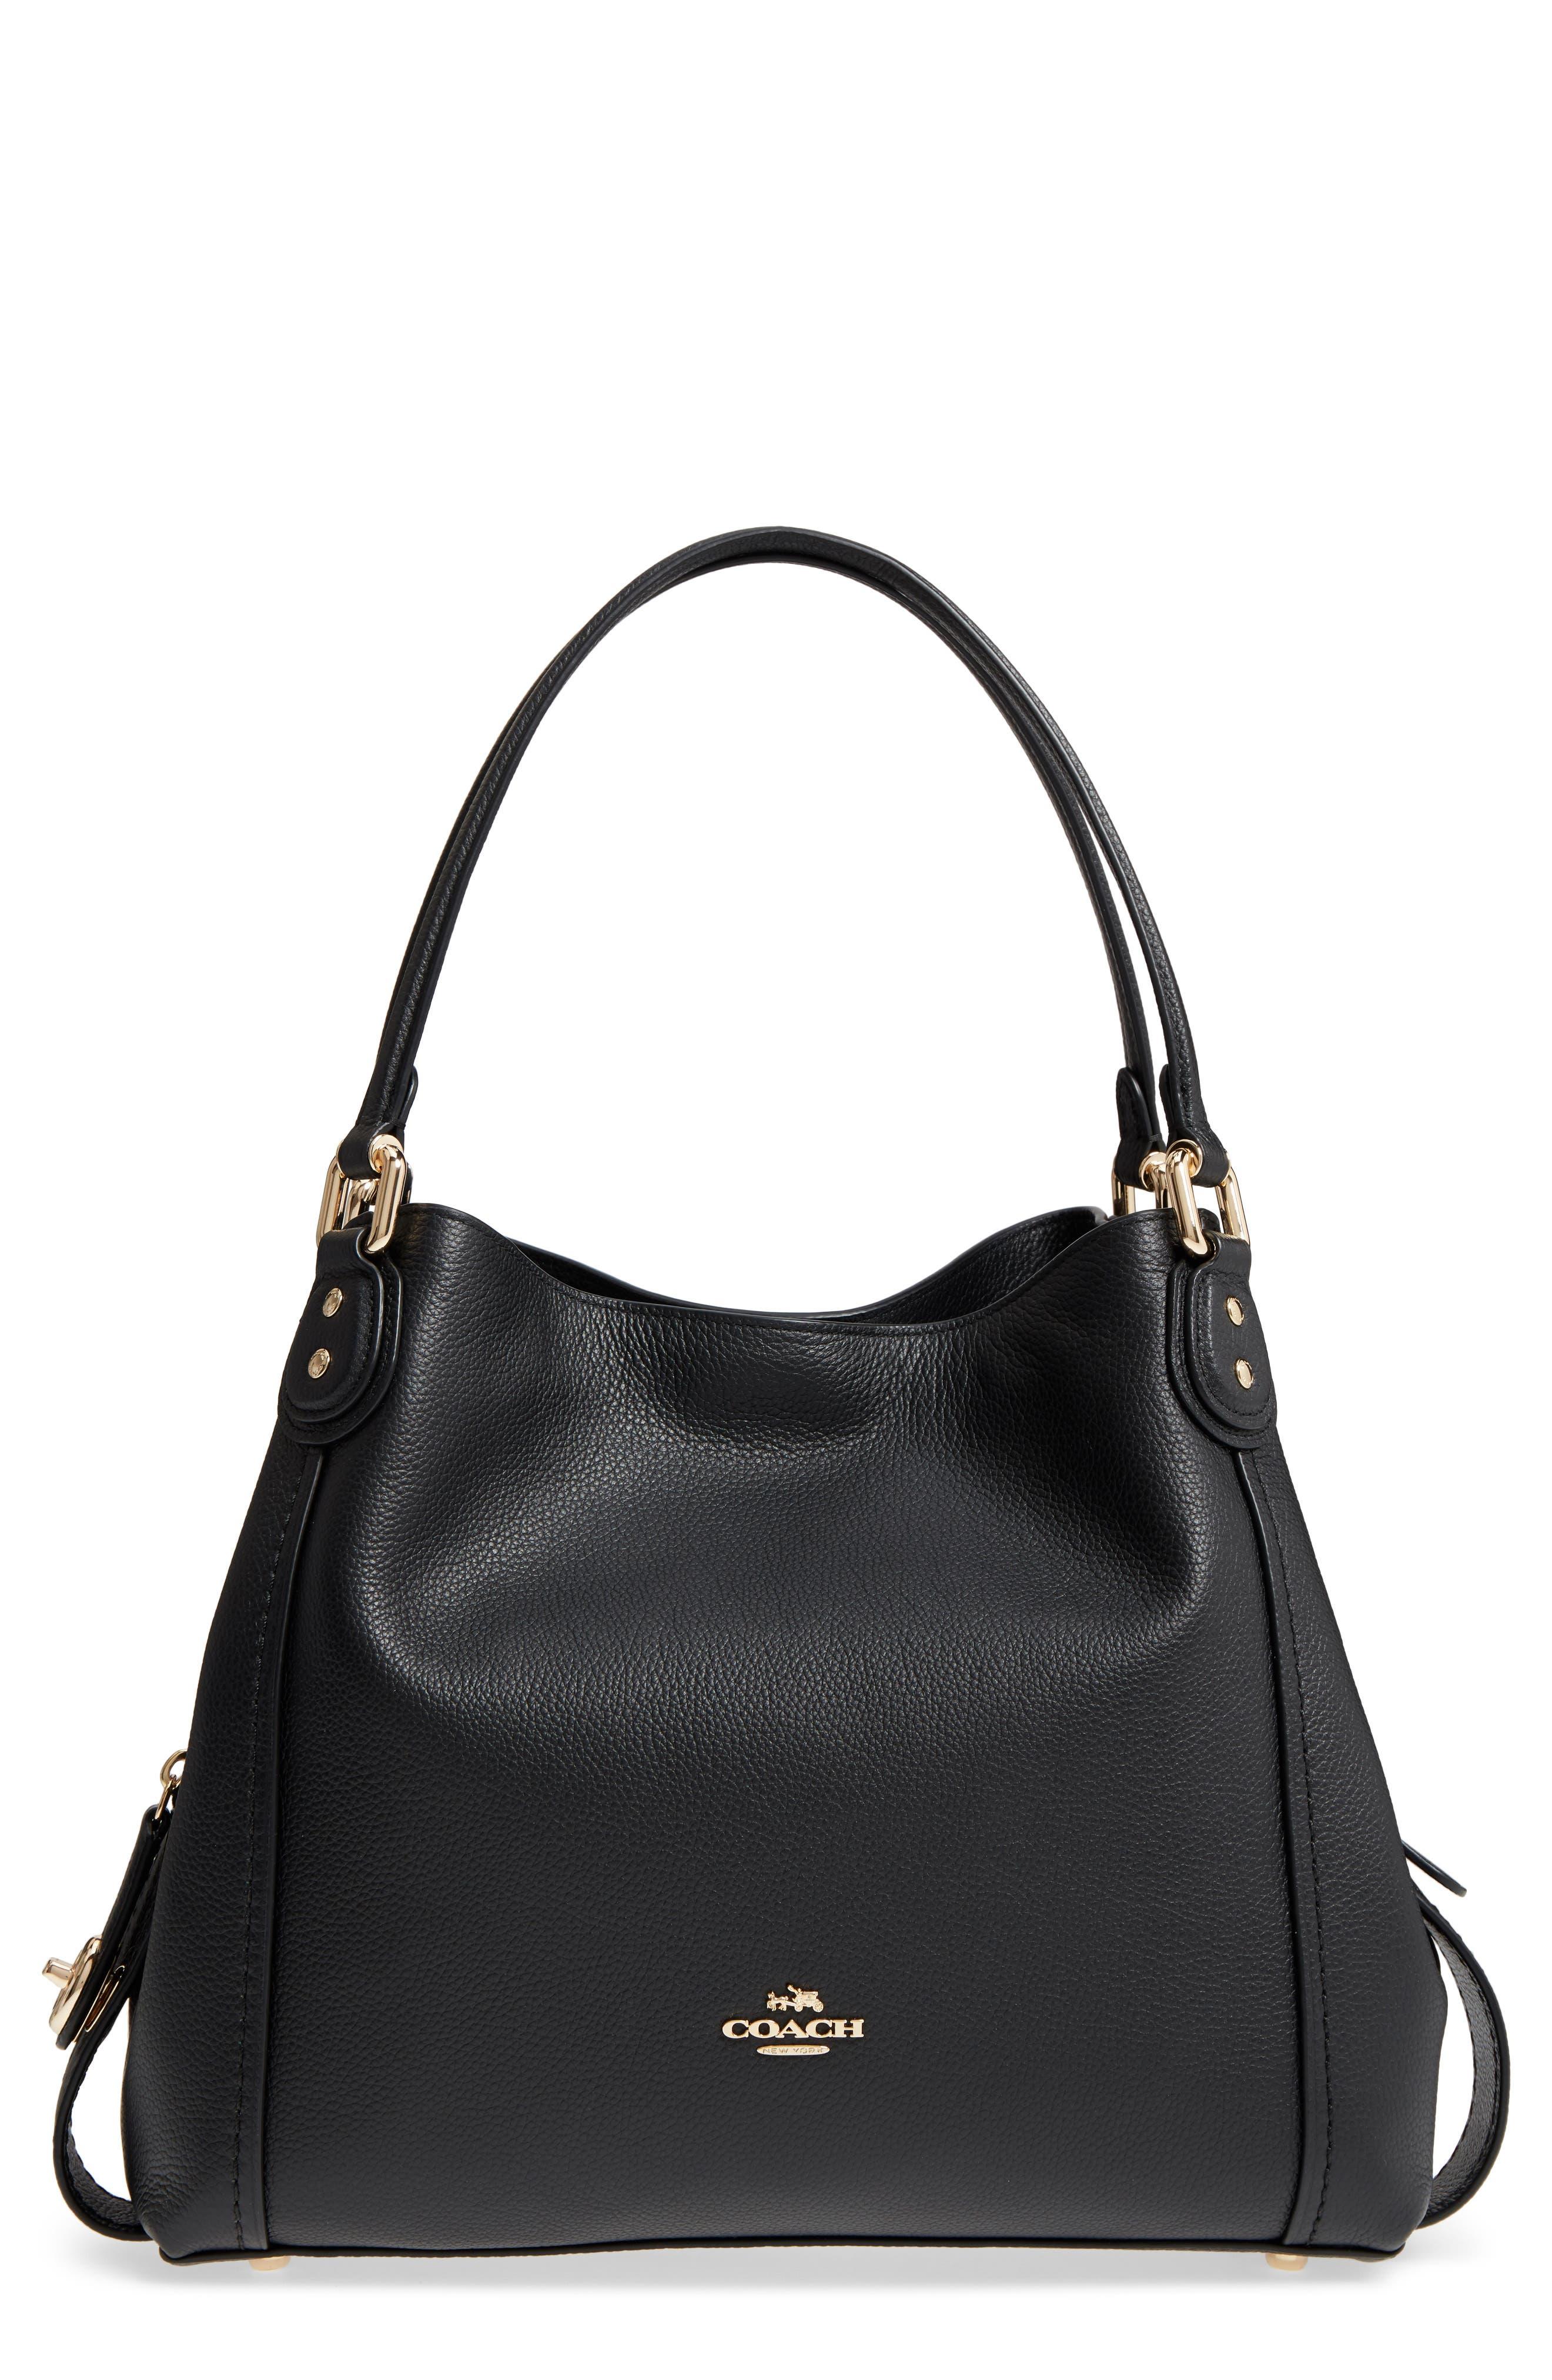 COACH Edie 31 Pebbled Leather Shoulder Bag